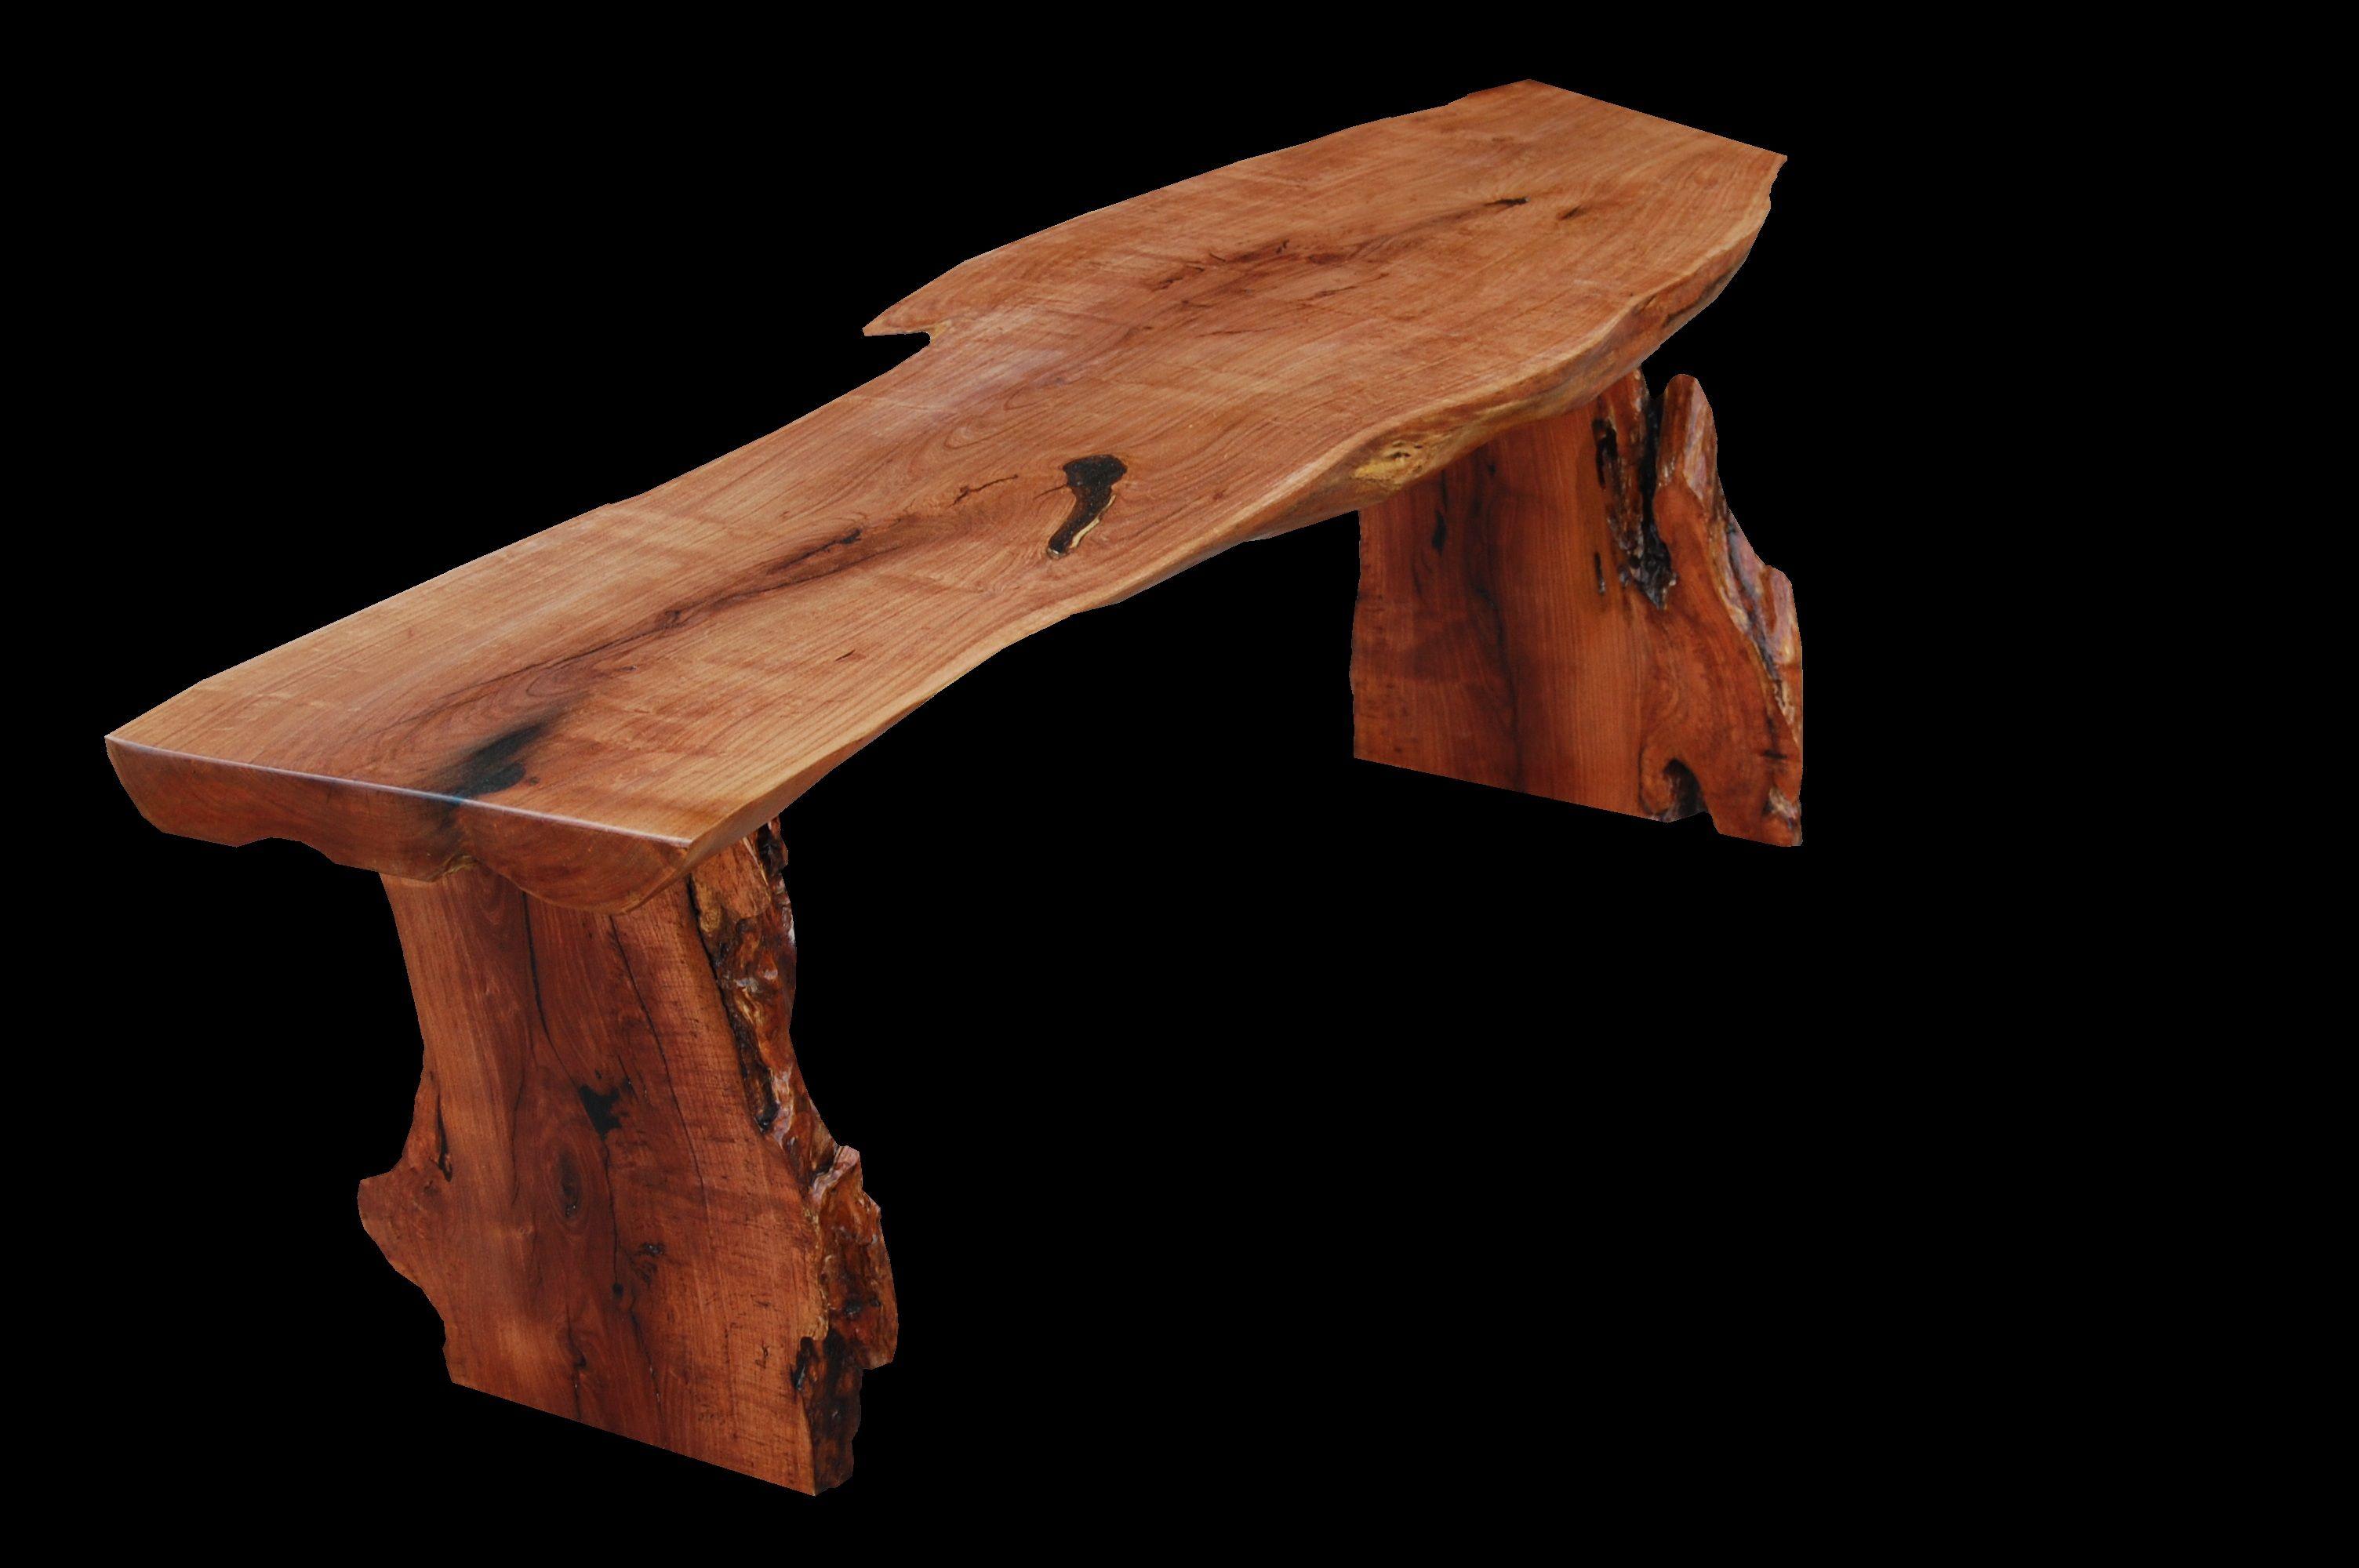 Custom Mesquite Wood Furniture   Countertops U0026 Bars In Texas | Faifer U0026  Company Inc